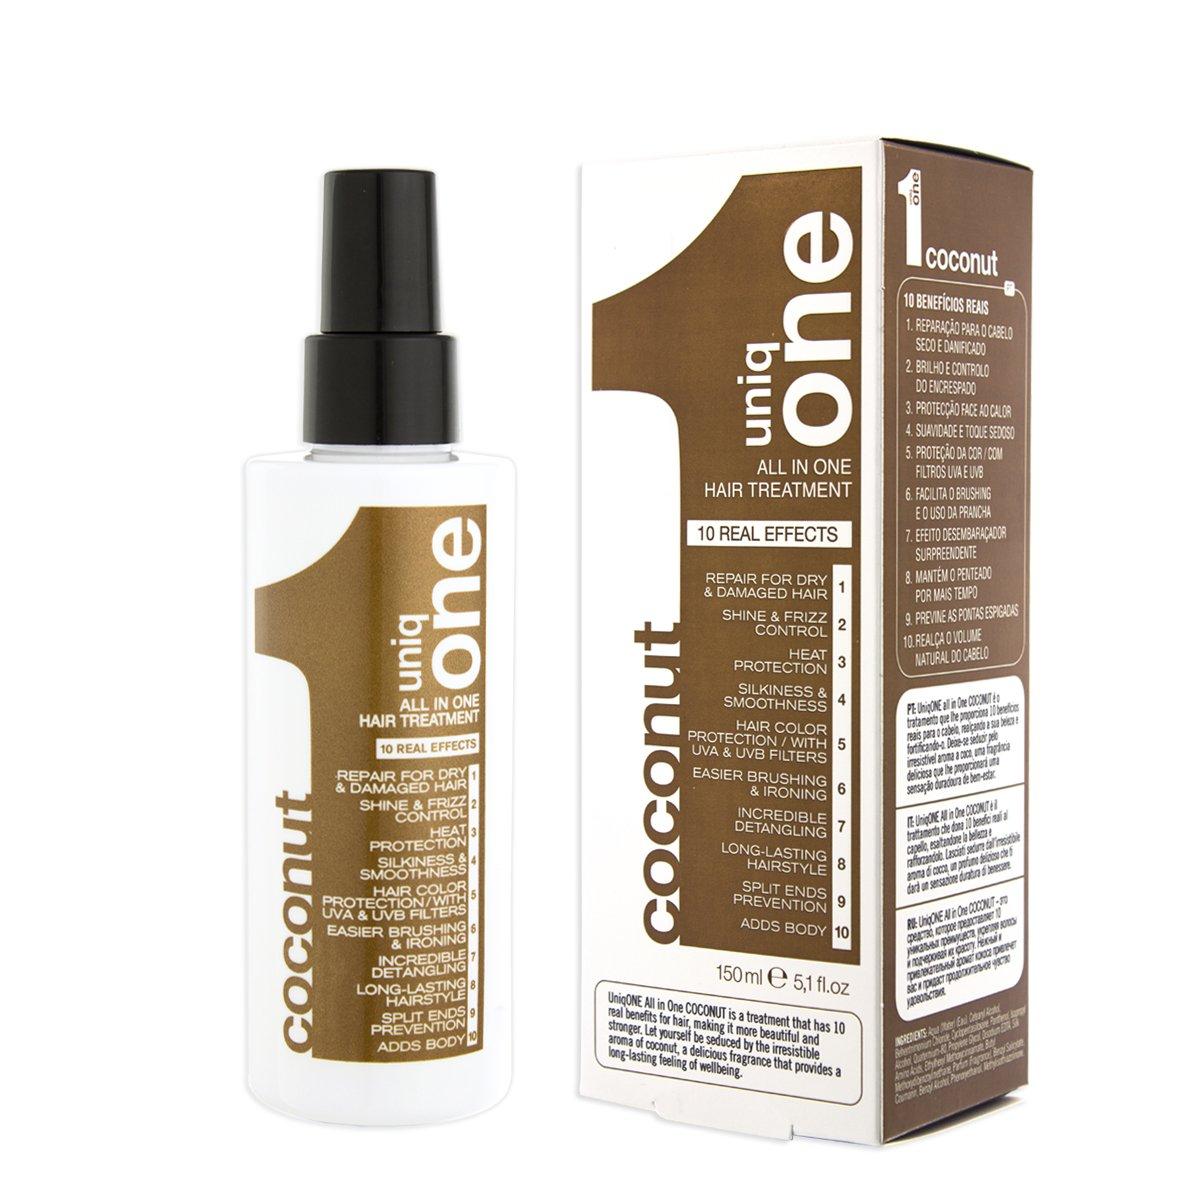 Revlon Uniq One Treatment Conditioner, Coconut 150 ml product image